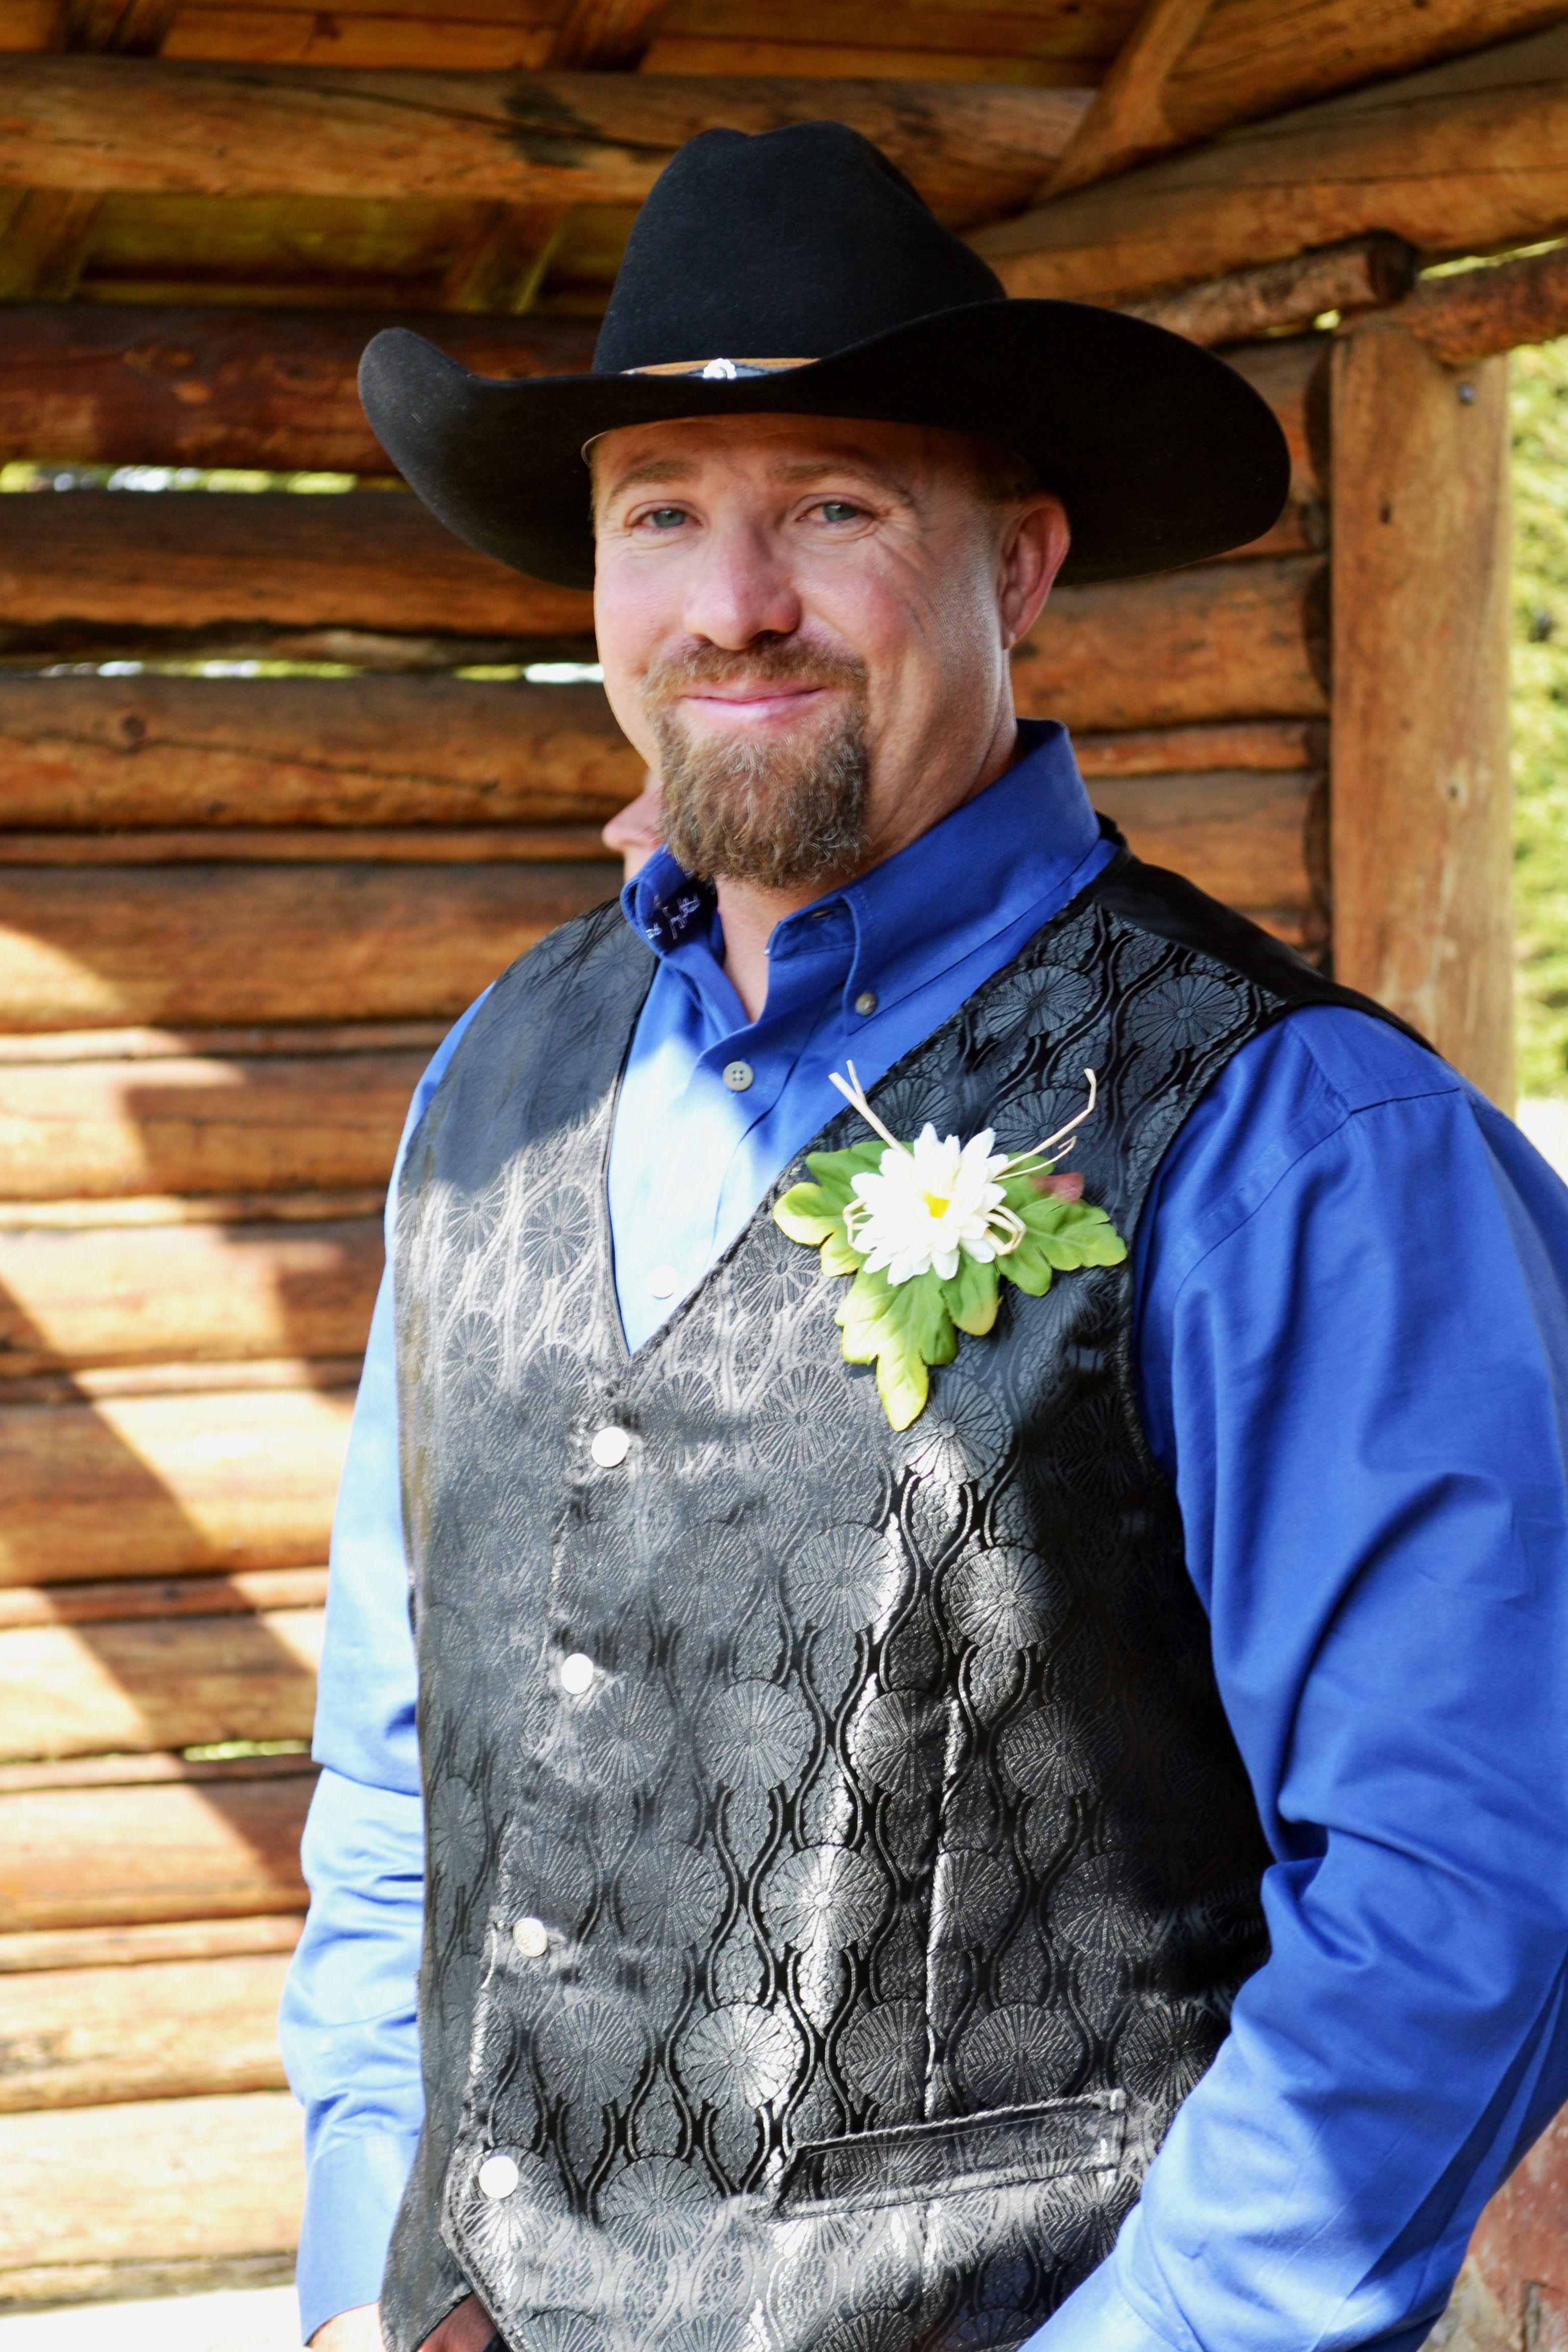 16++ Western wedding attire for groom info